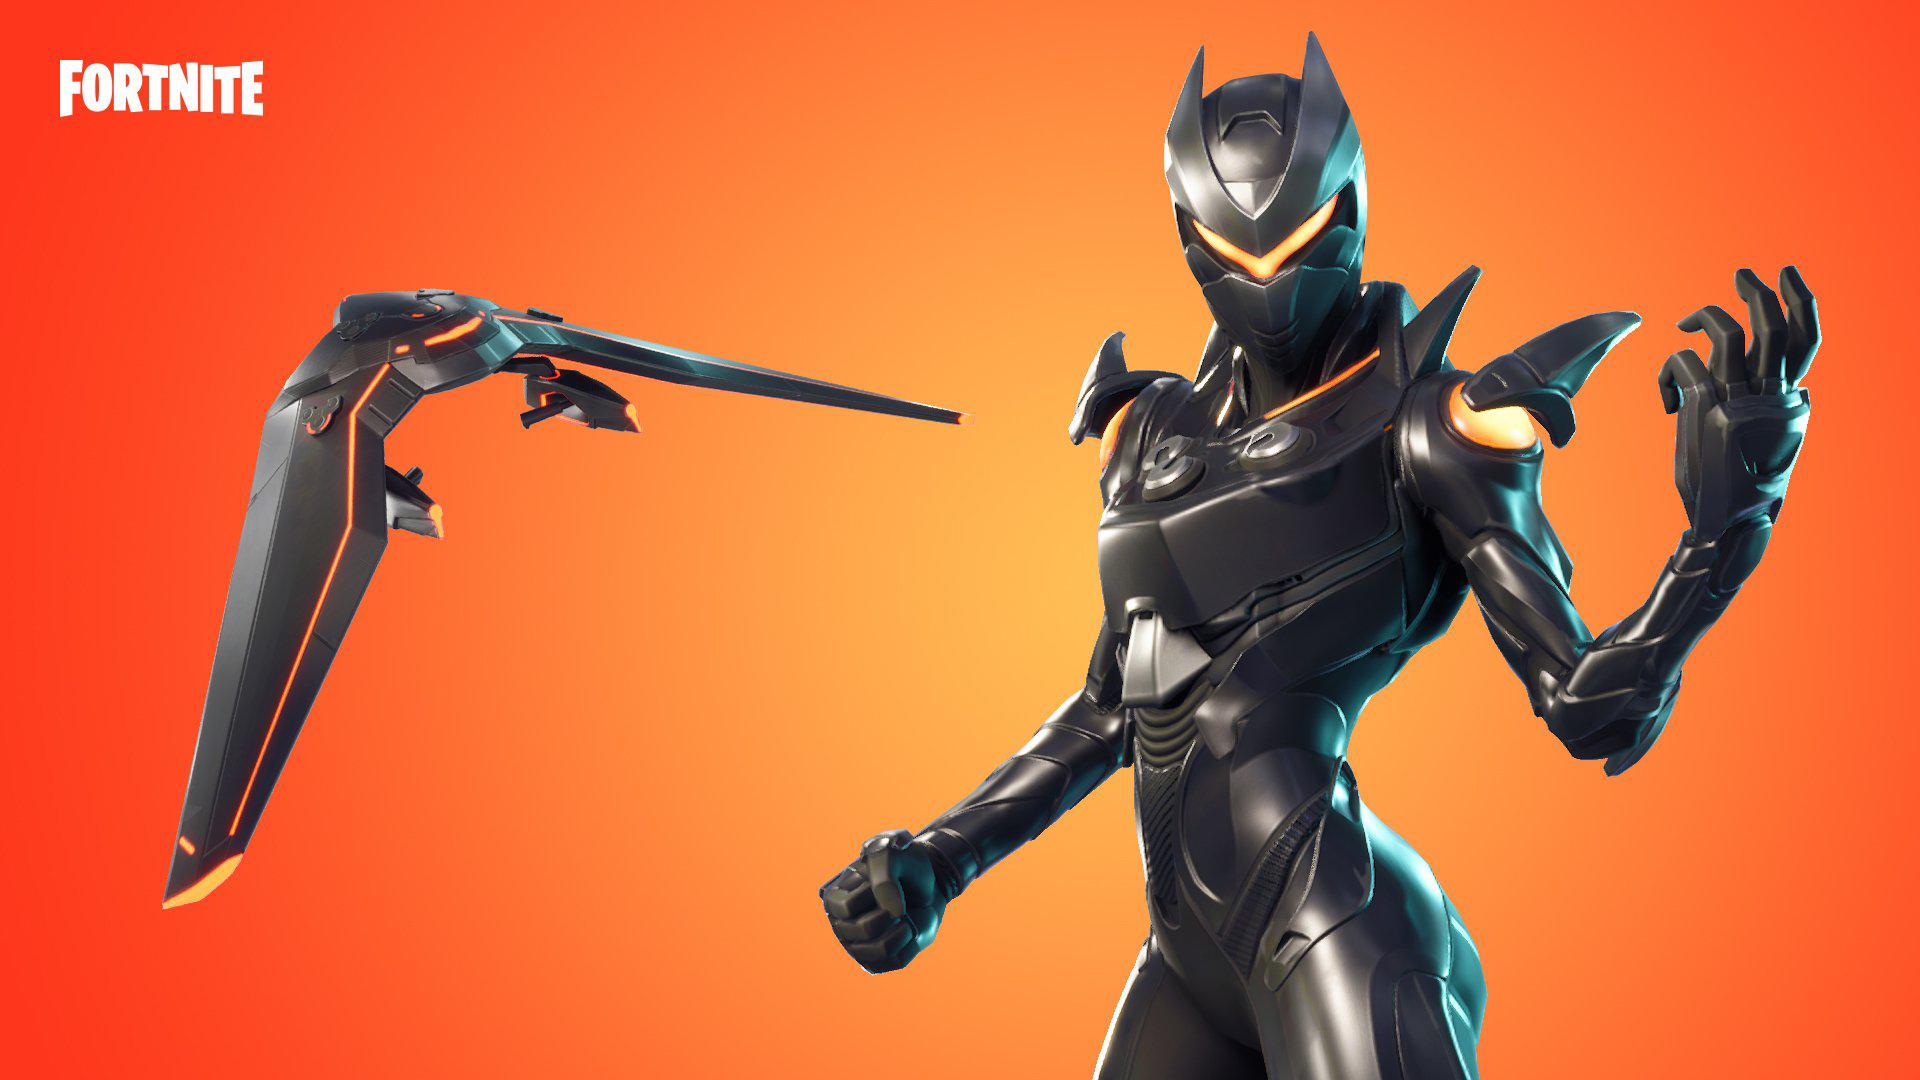 Fortnite Elite Agent Skin